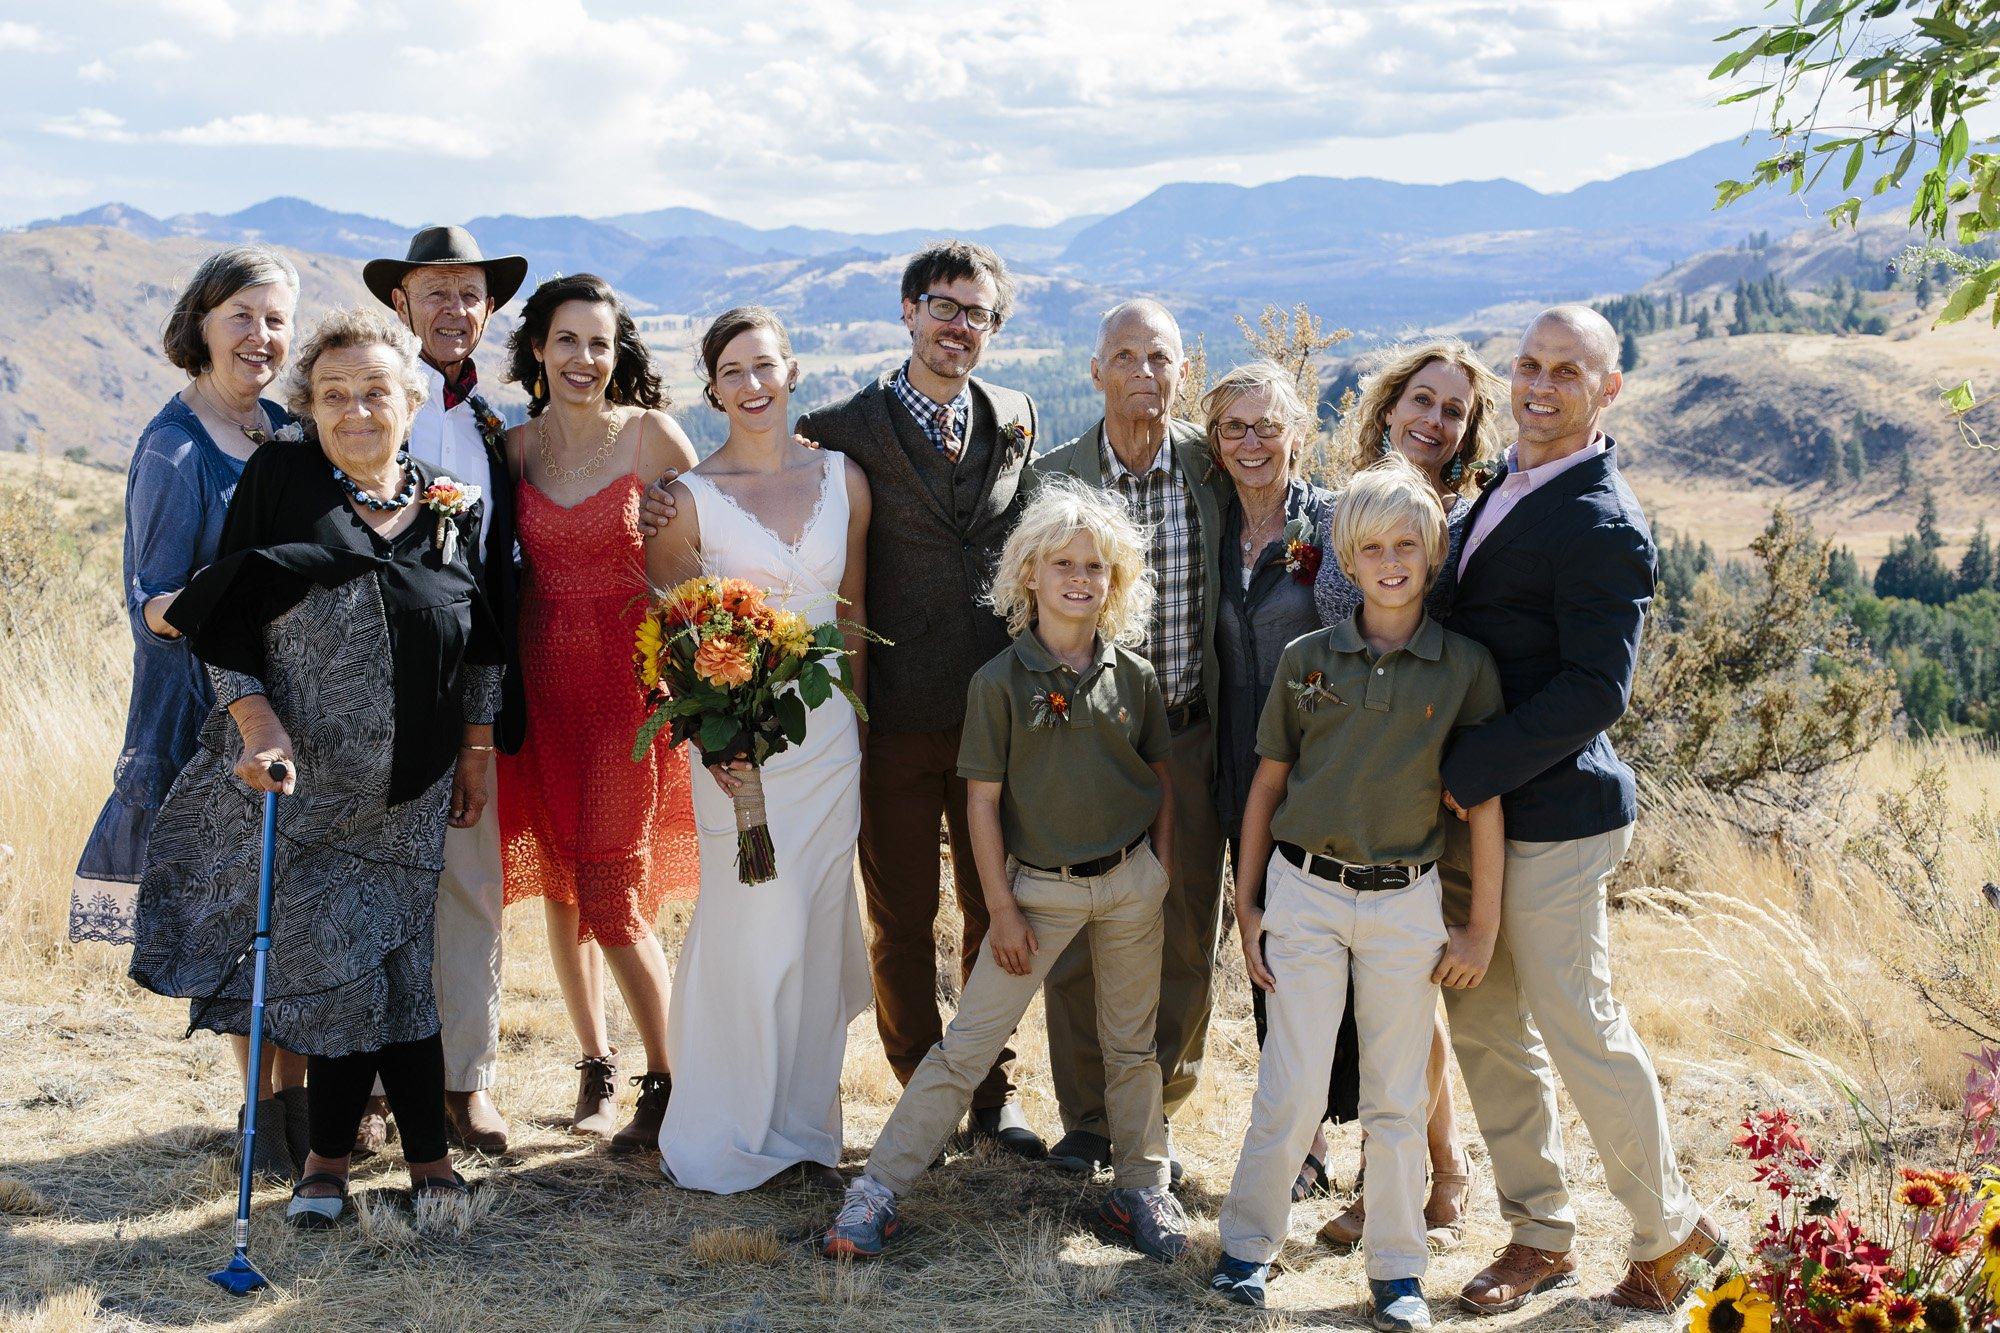 Small family photos for wedding